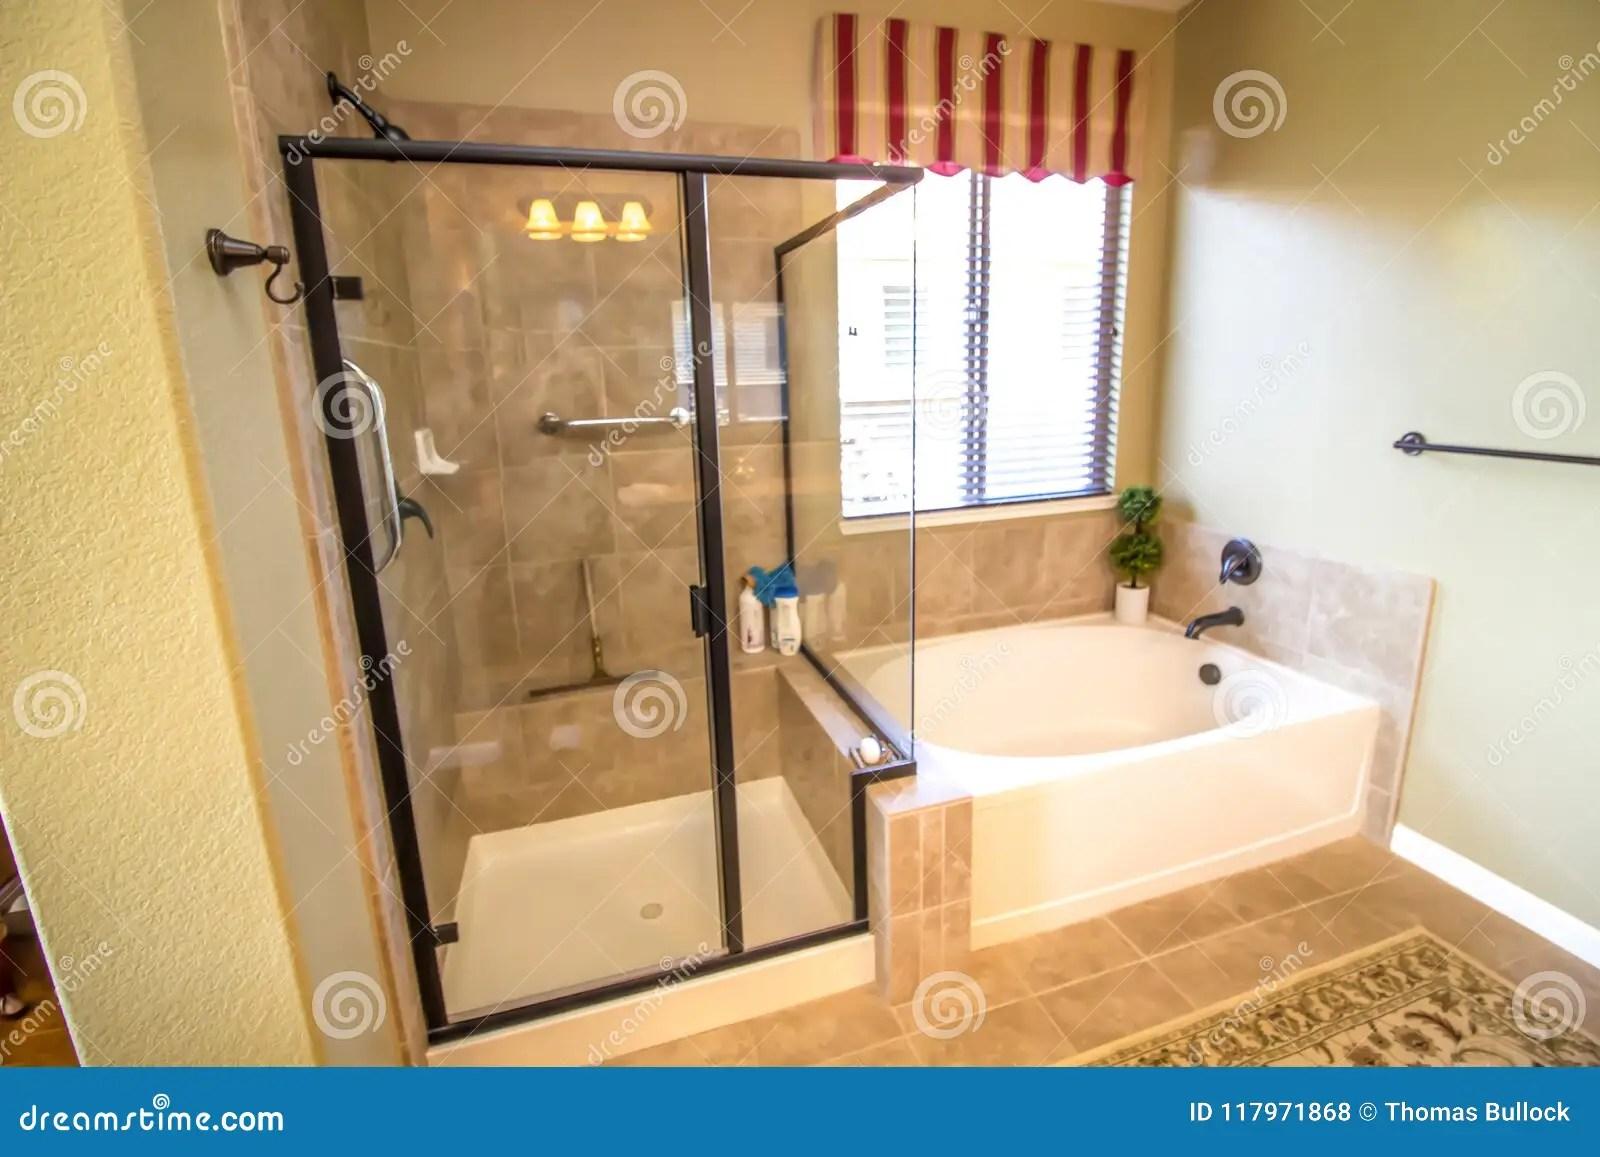 https www dreamstime com modern bathroom shower tub modern bathroom glass enclosed shower bathtub tile floor image117971868